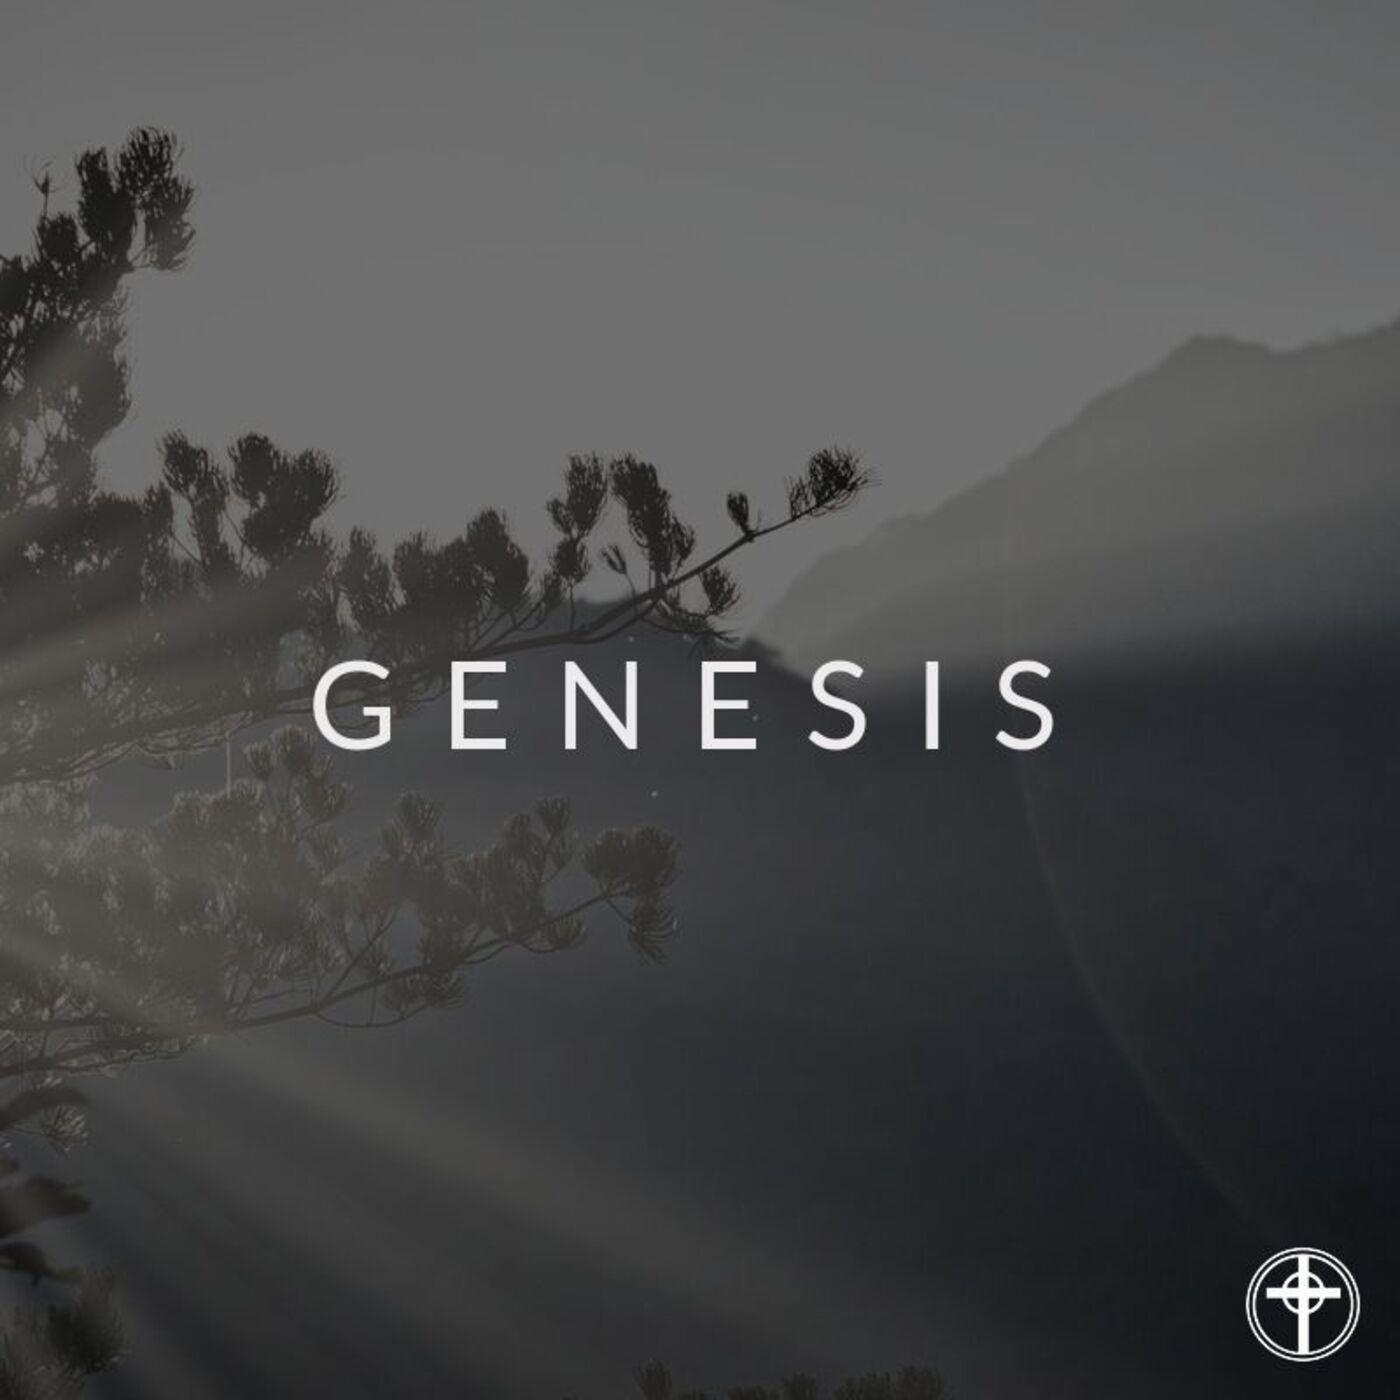 Genesis - Blessed Intervention - Genesis 49:1-12